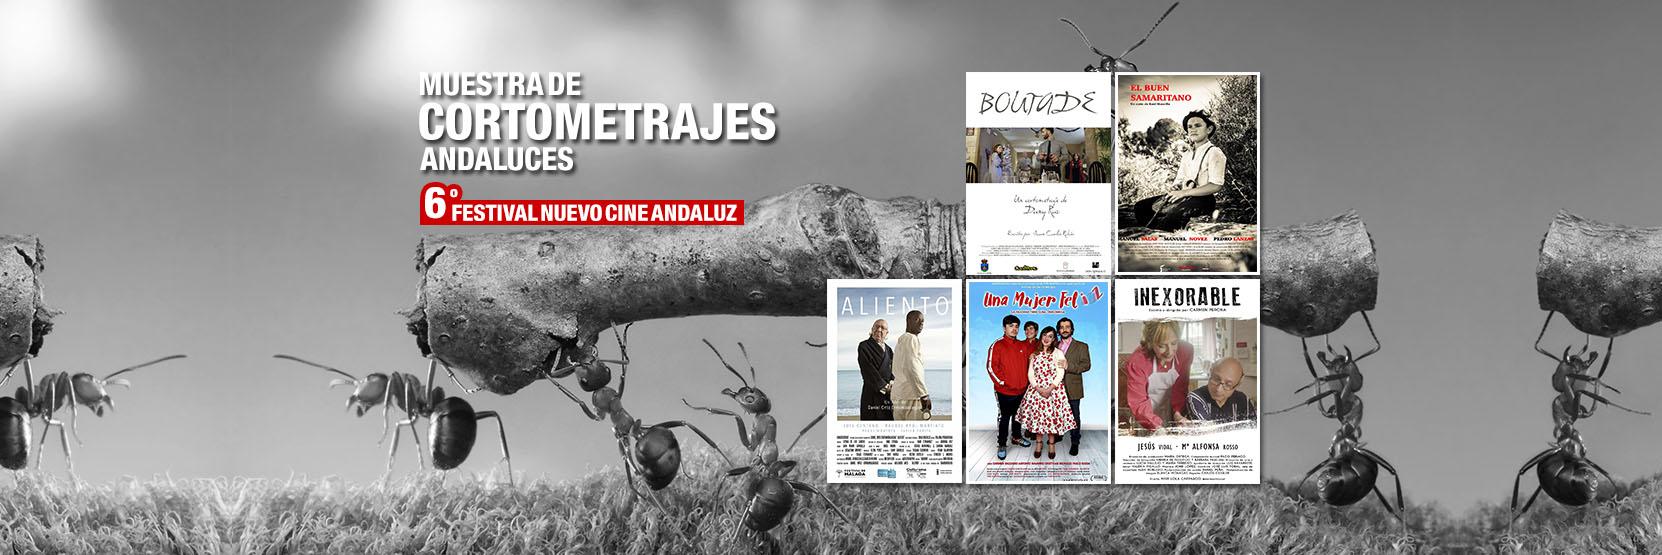 Muestra de Cortometrajes Andaluces 2019